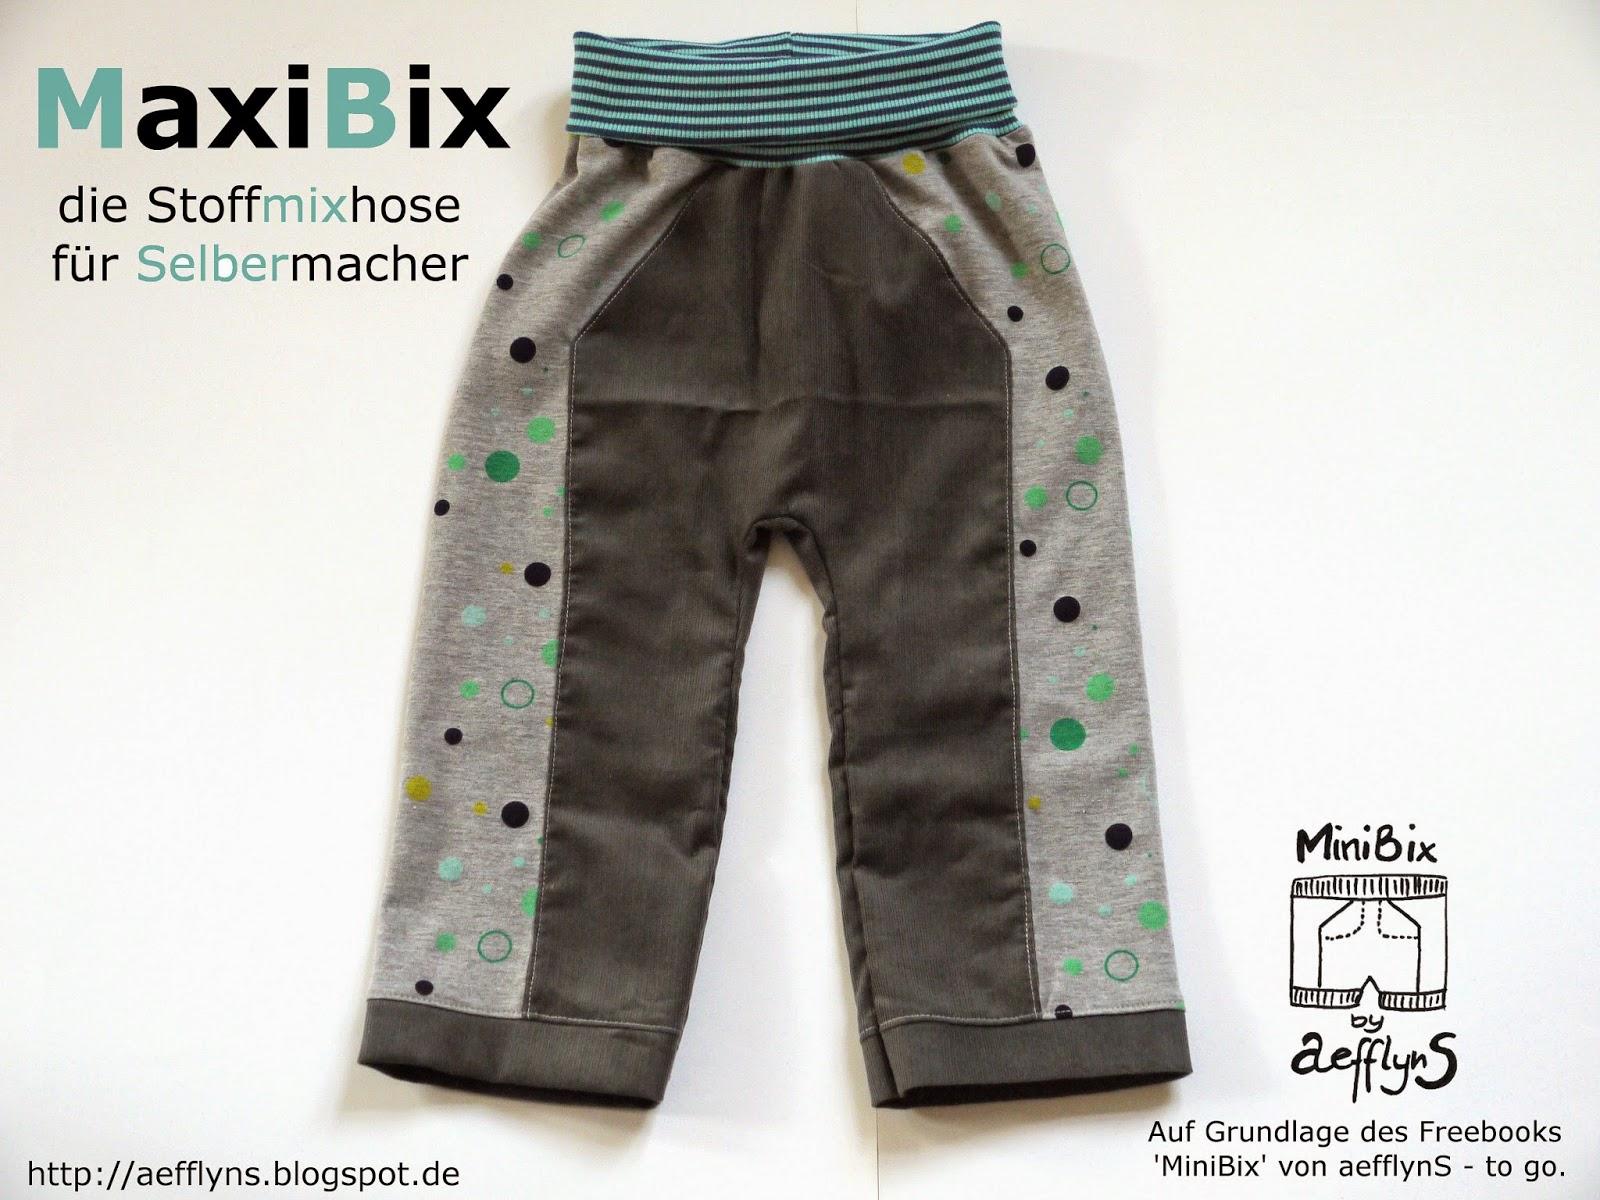 http://aefflyns.blogspot.de/2014/08/minibix-goes-maxibix-freebook-fur.html